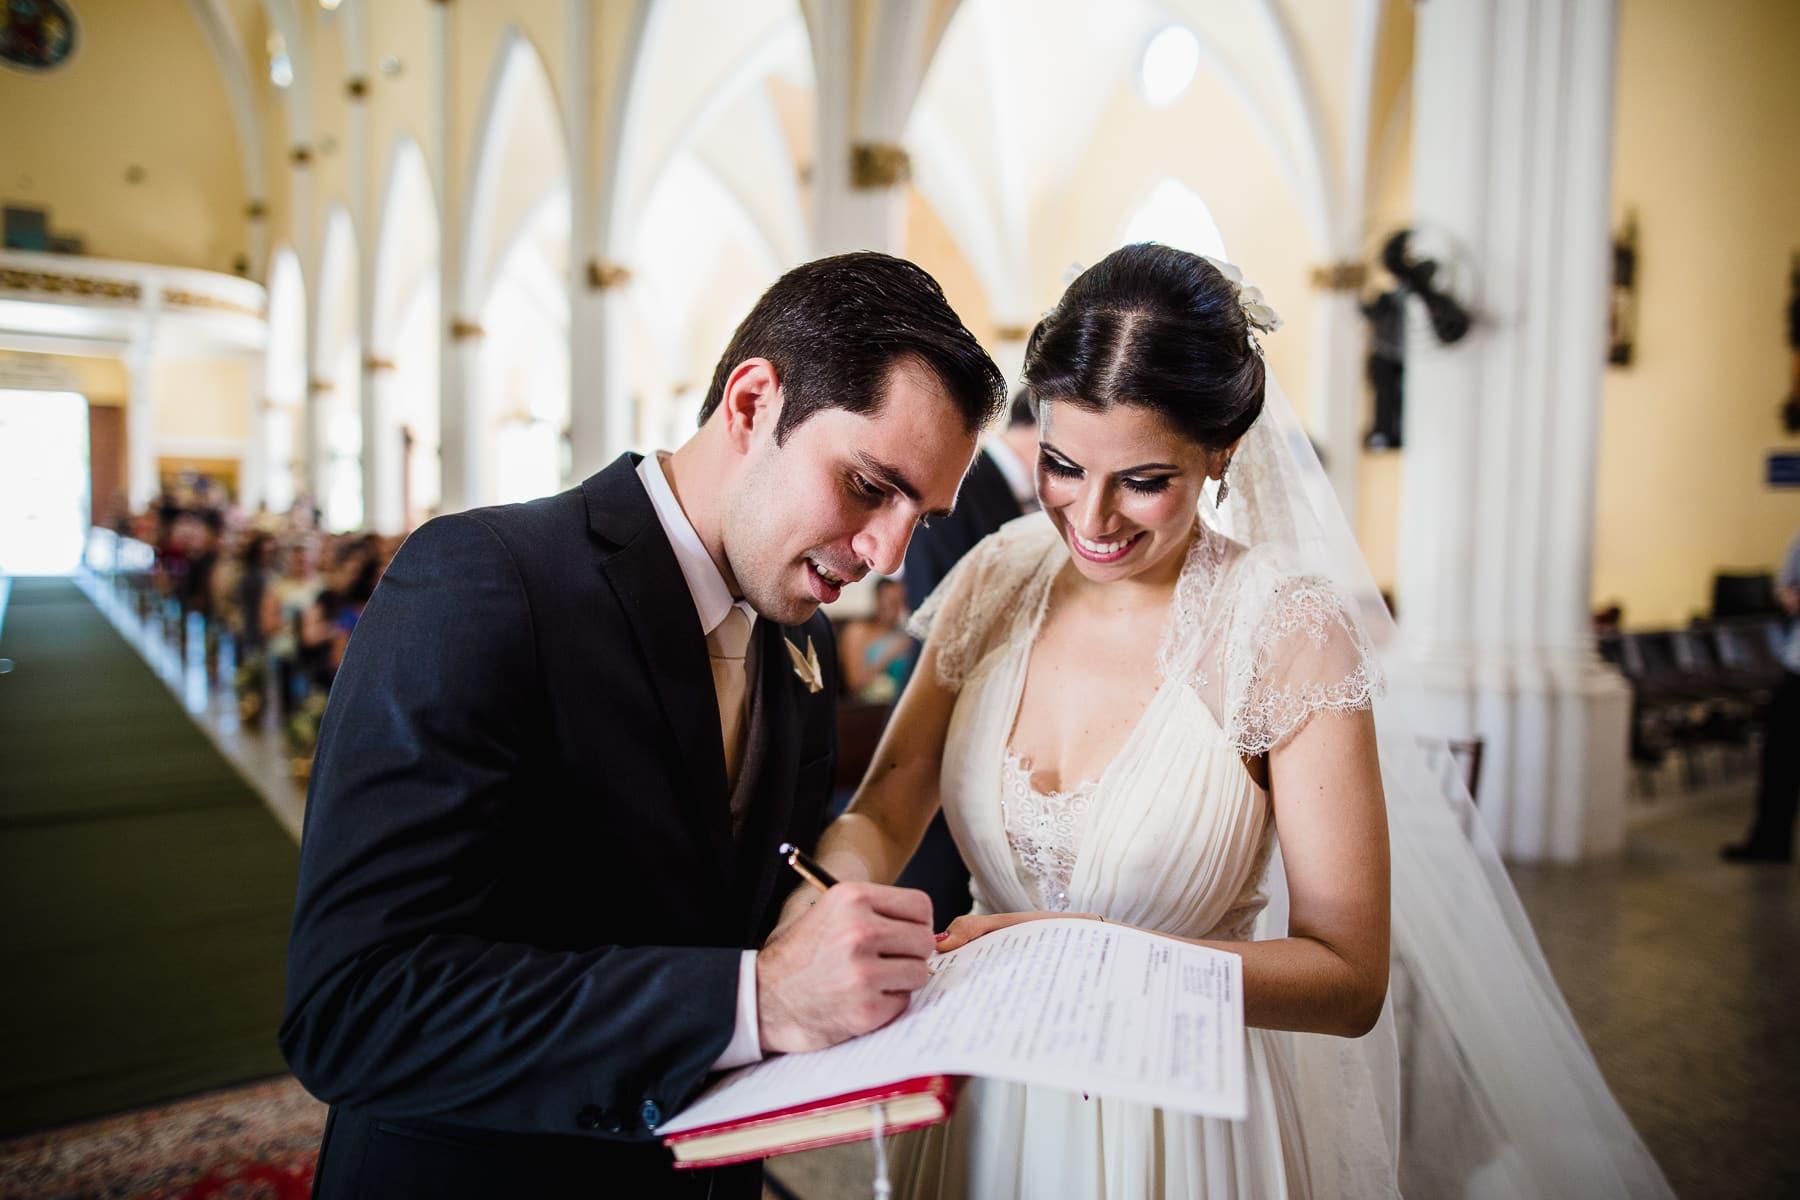 casamento-igreja-do-cristo-rei-fortaleza-54